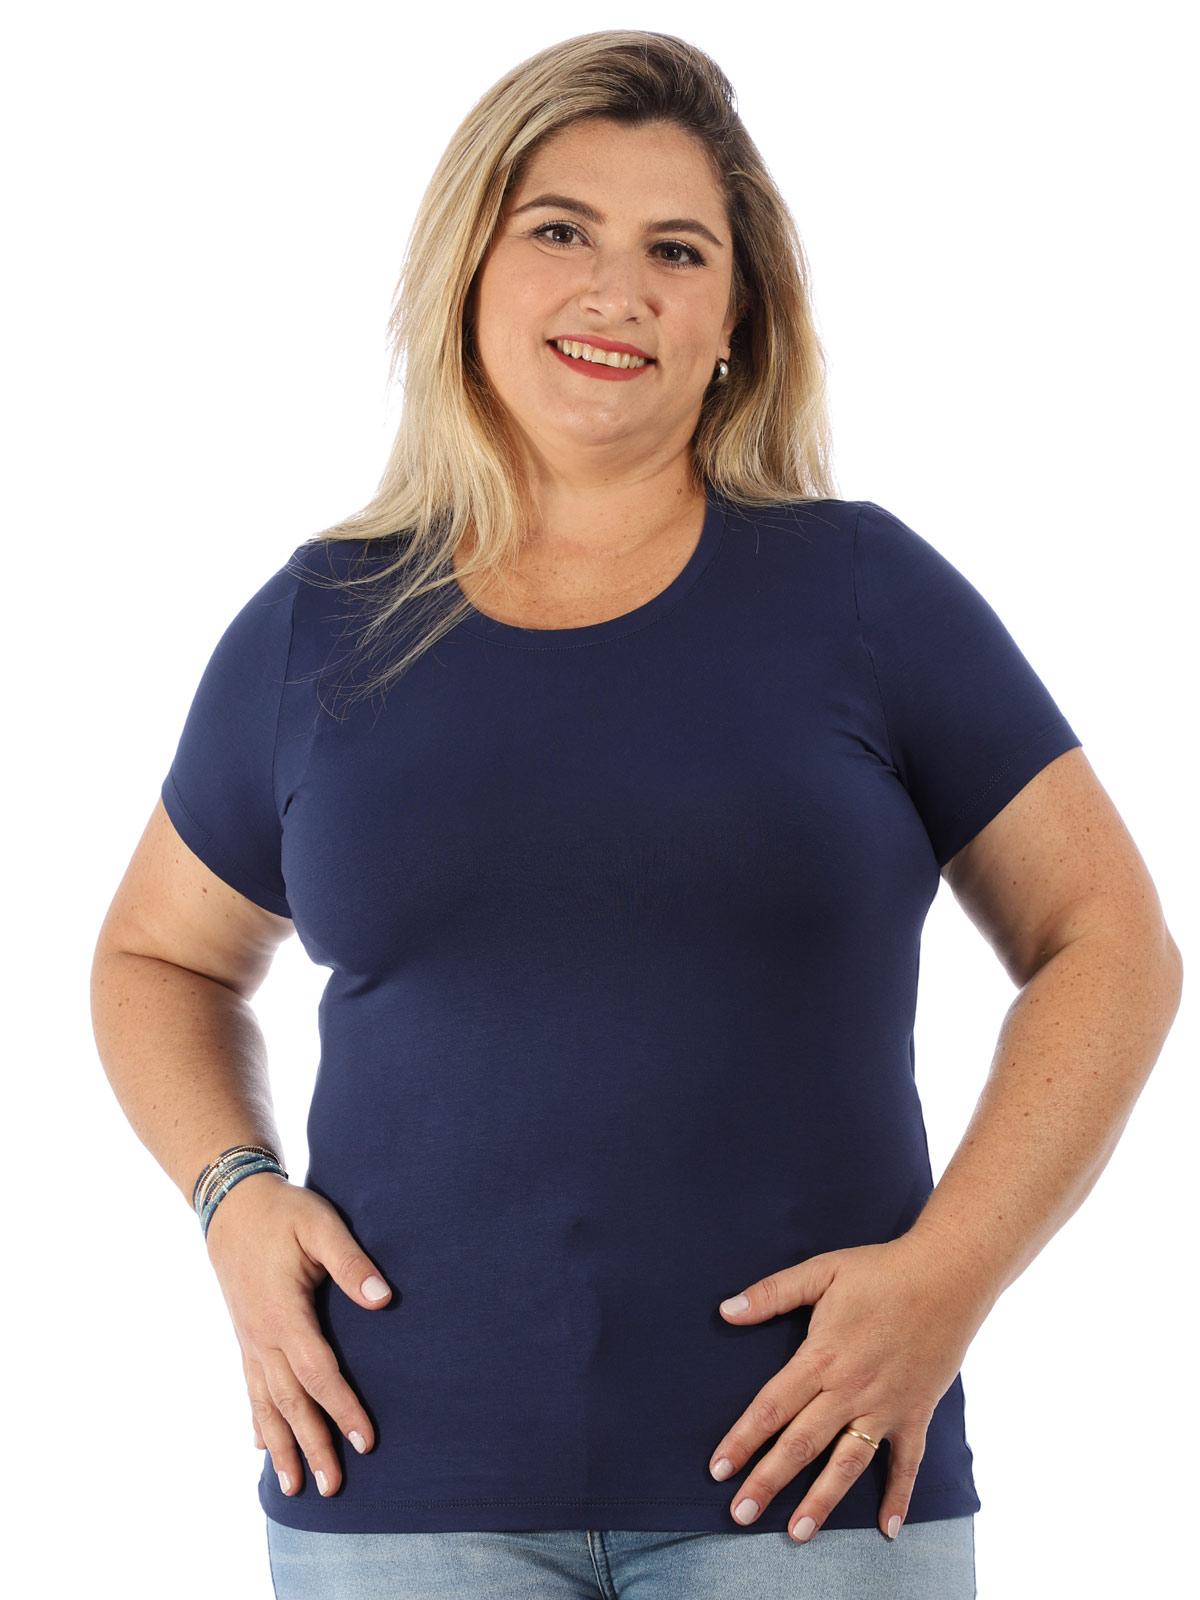 Blusa Plus Size Feminina Viscolycra Decote Redondo Azul Marinho